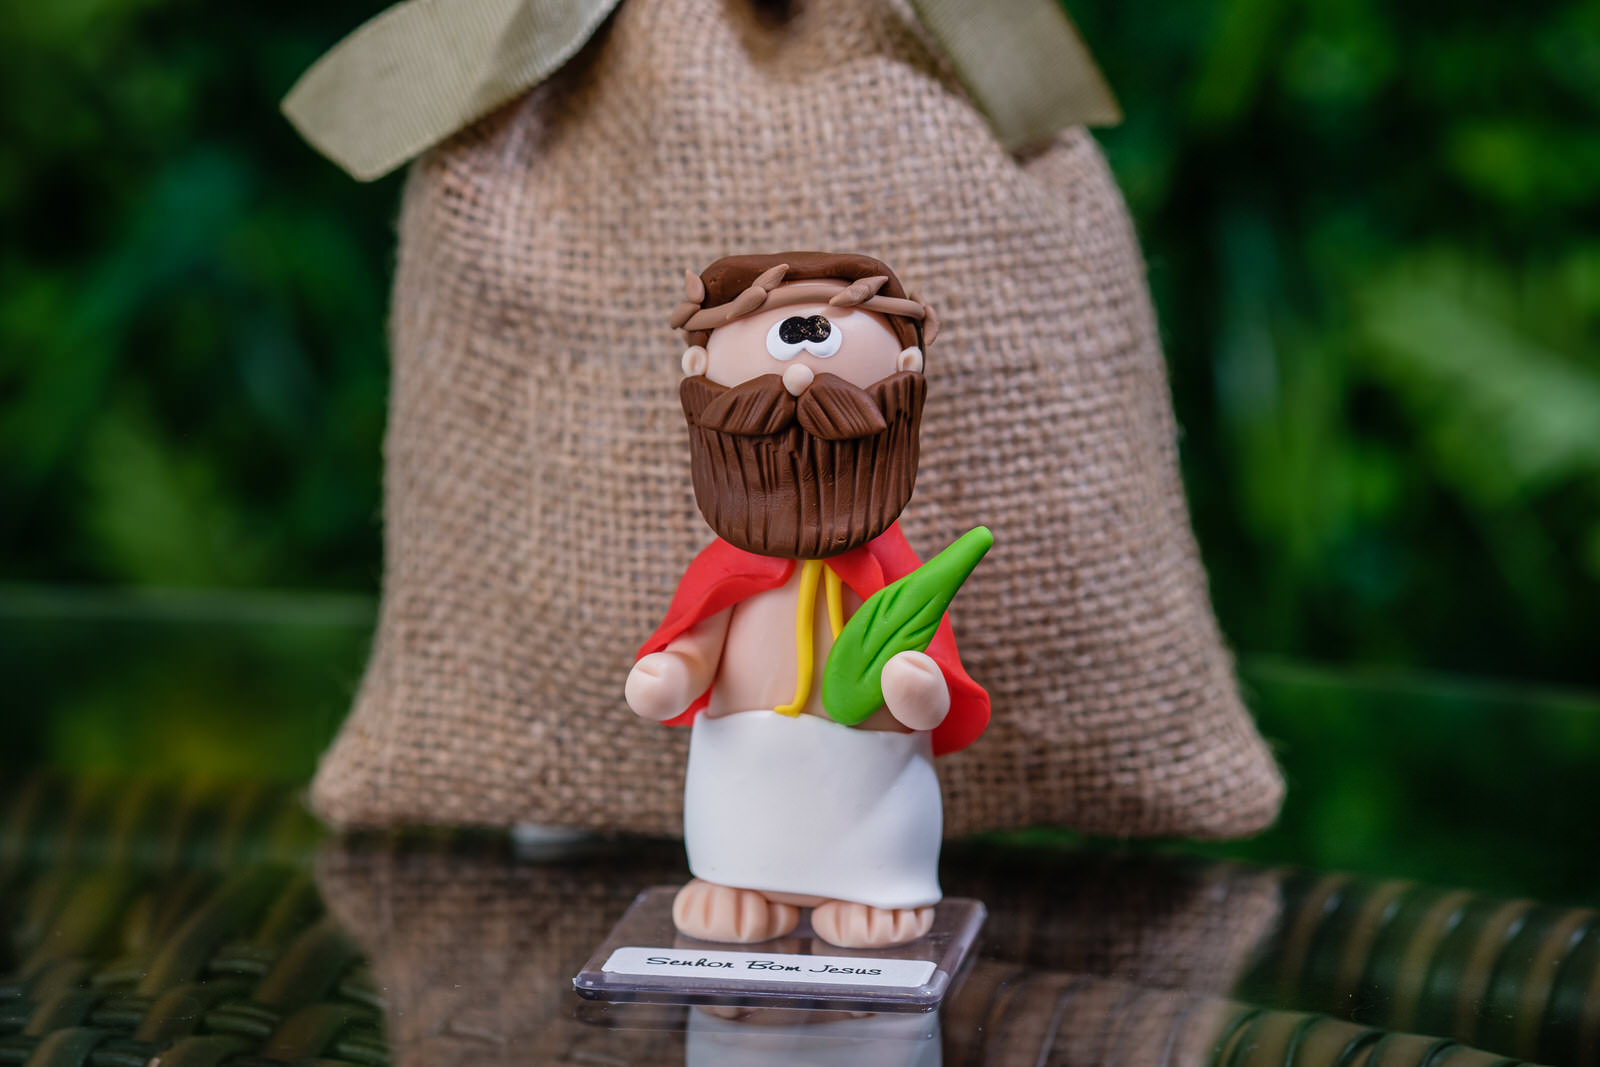 Senhor Bom Jesus em Biscuit